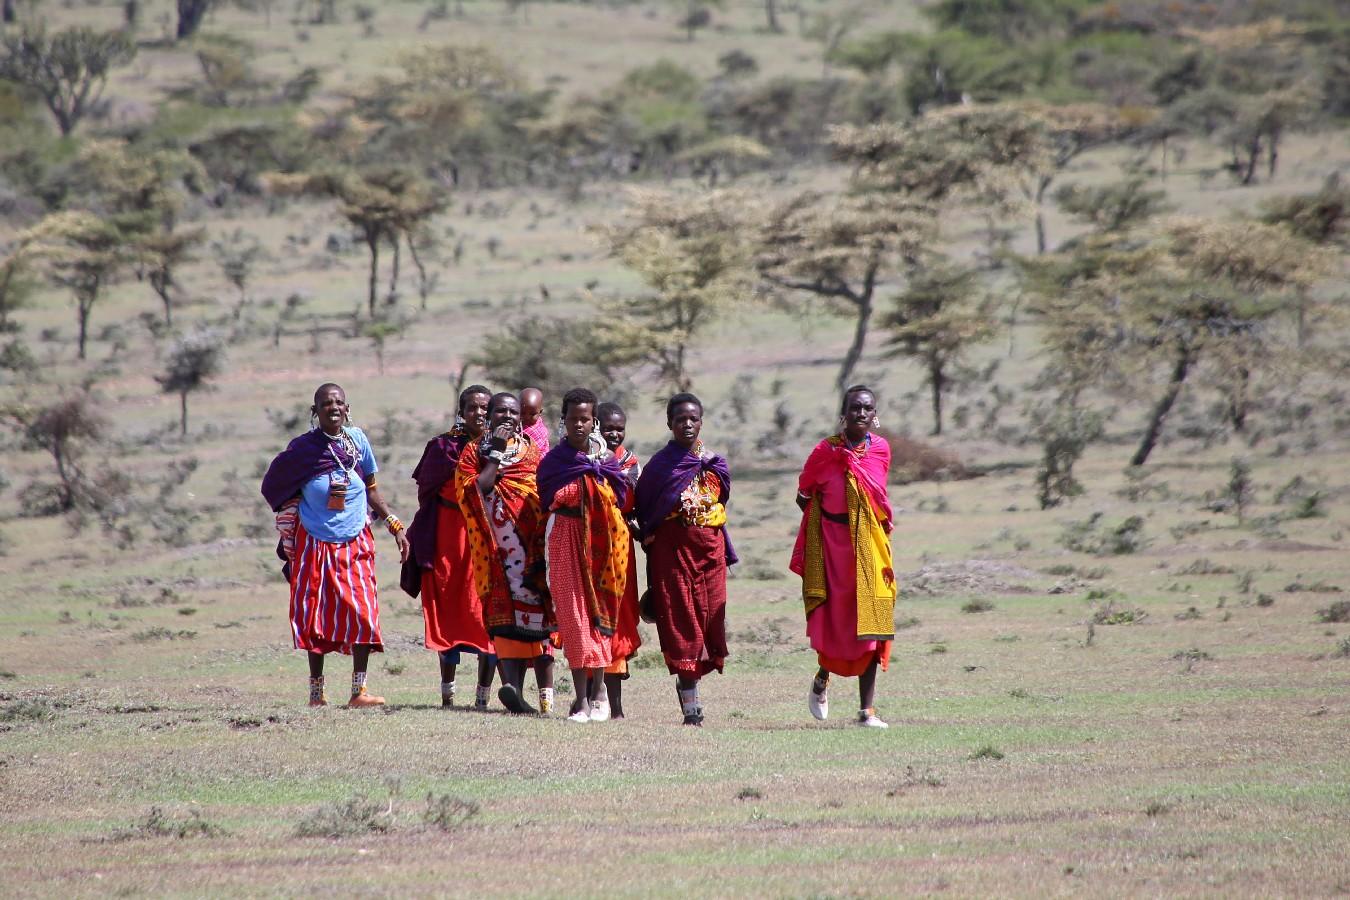 Frauenrechte in Kenia #stopFGM – julia-hitthaler.com